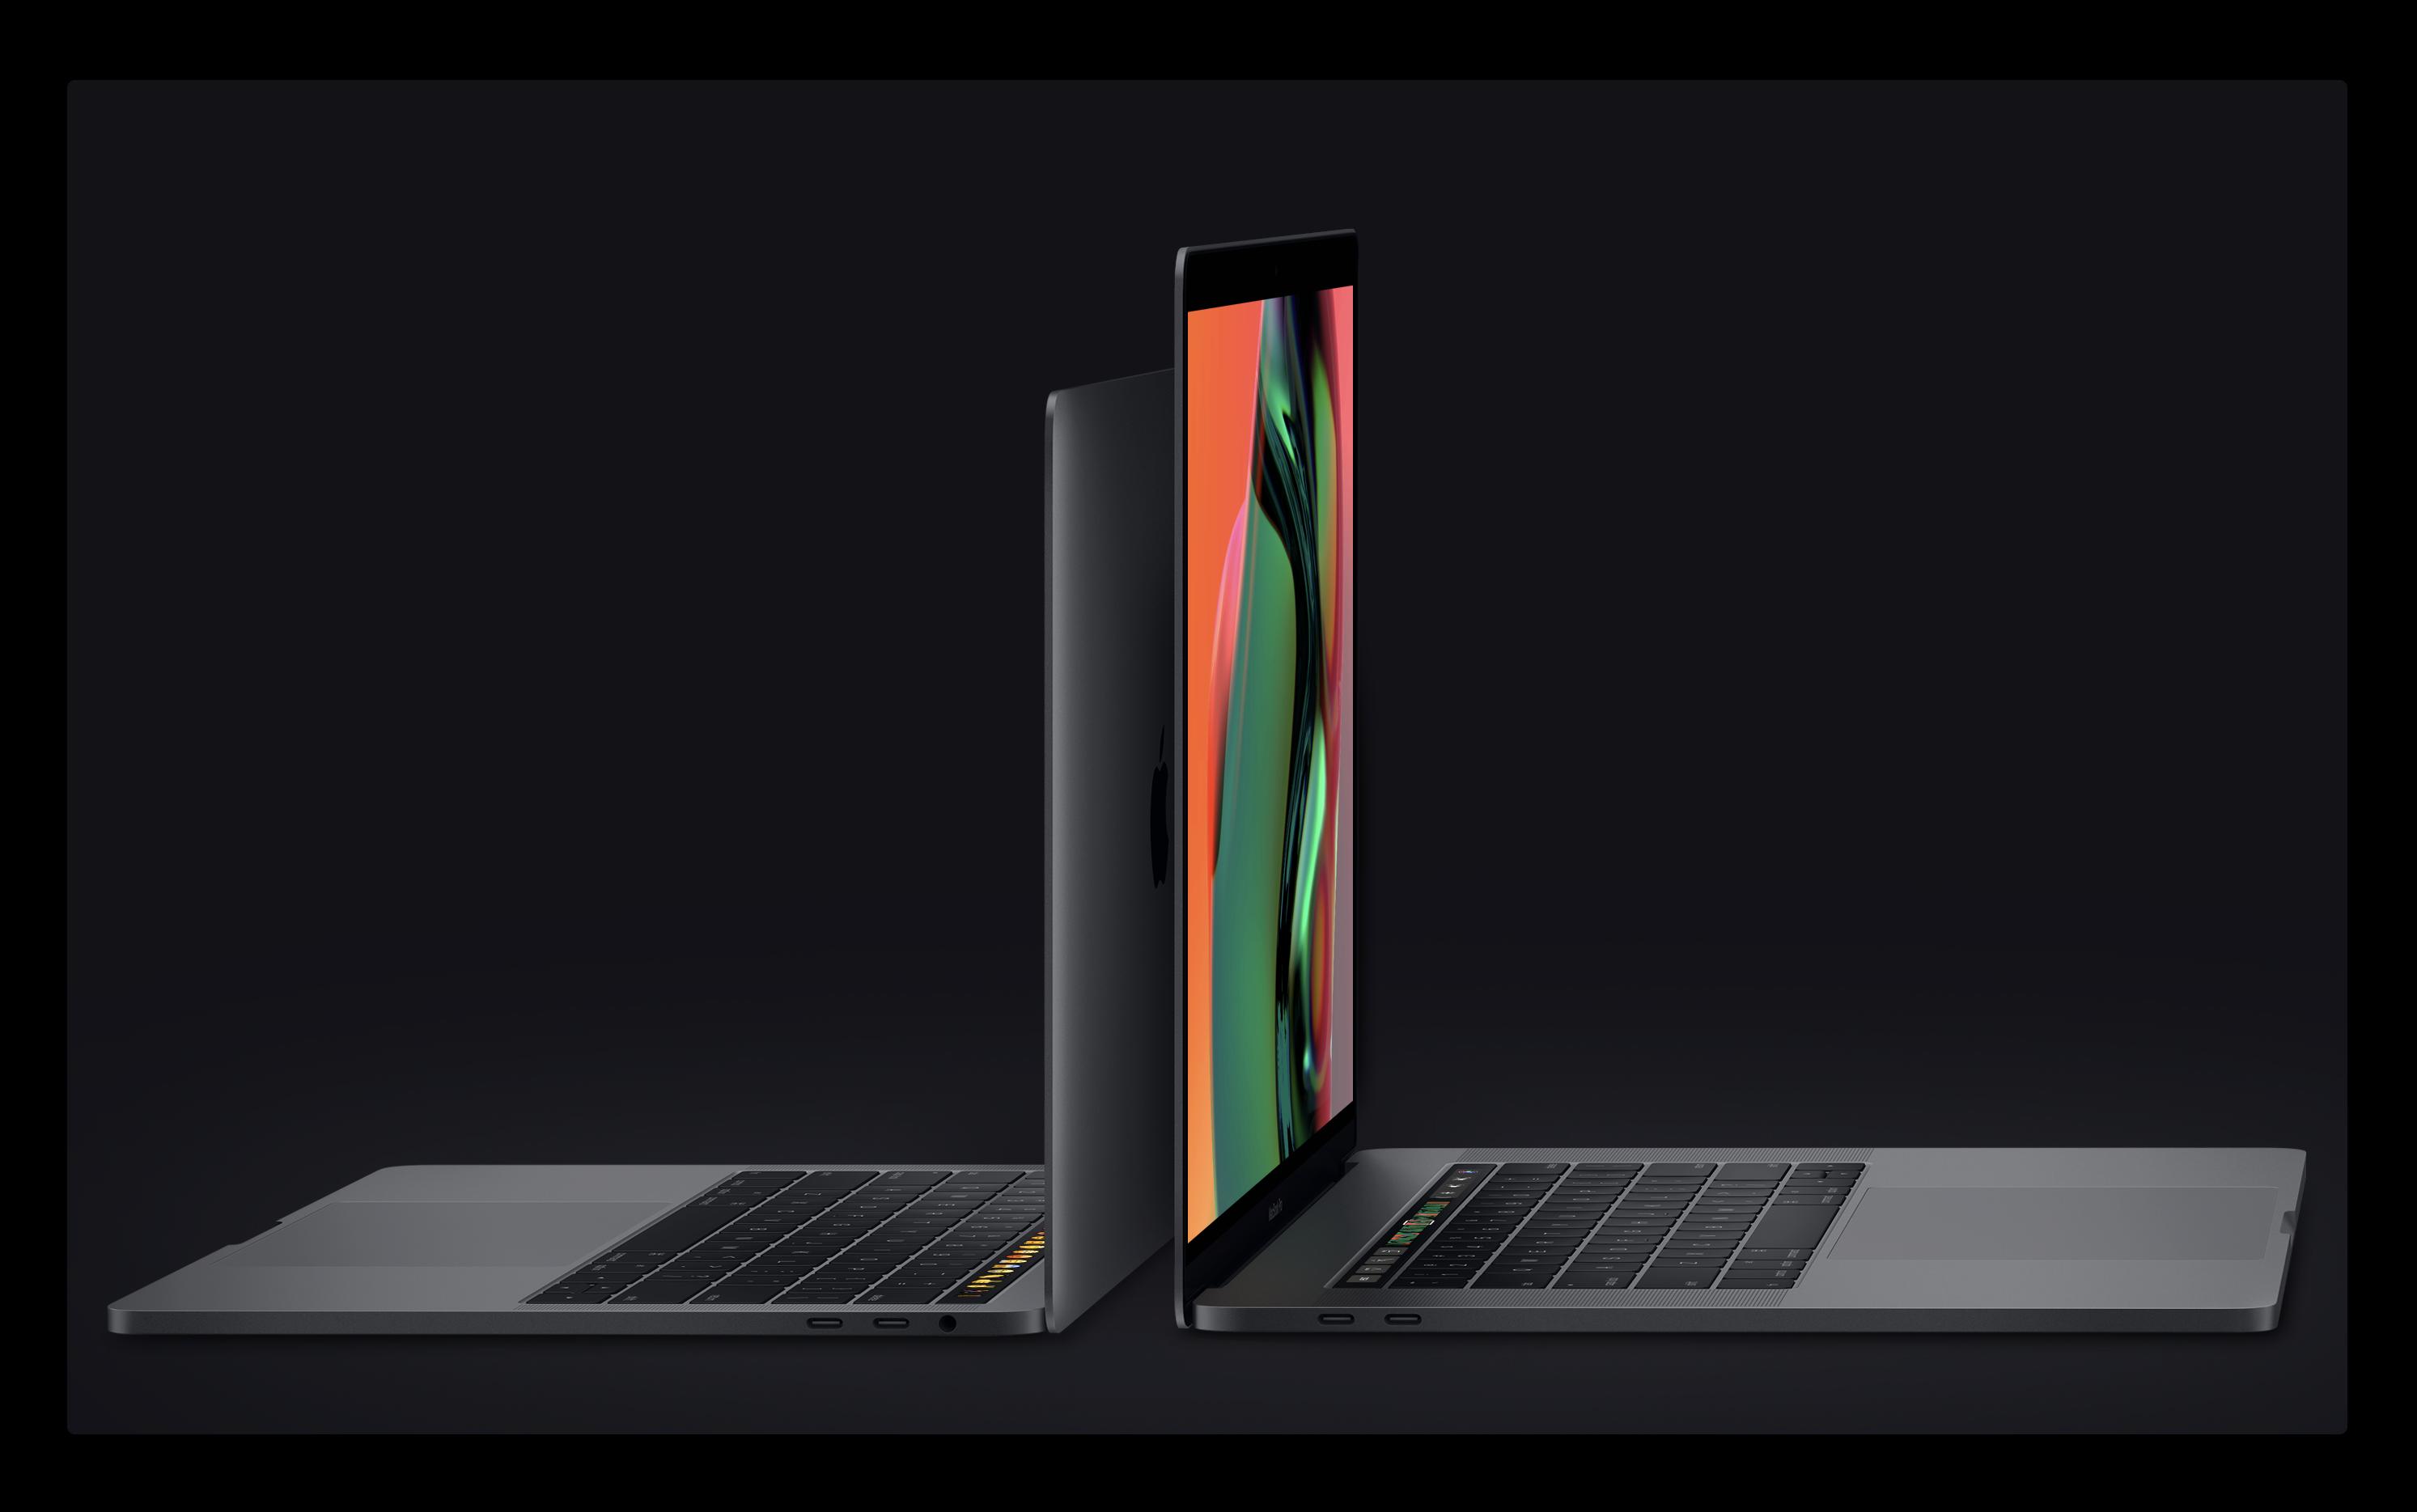 Primate Labs、MacBook Pro 2018のベンチマークを公開